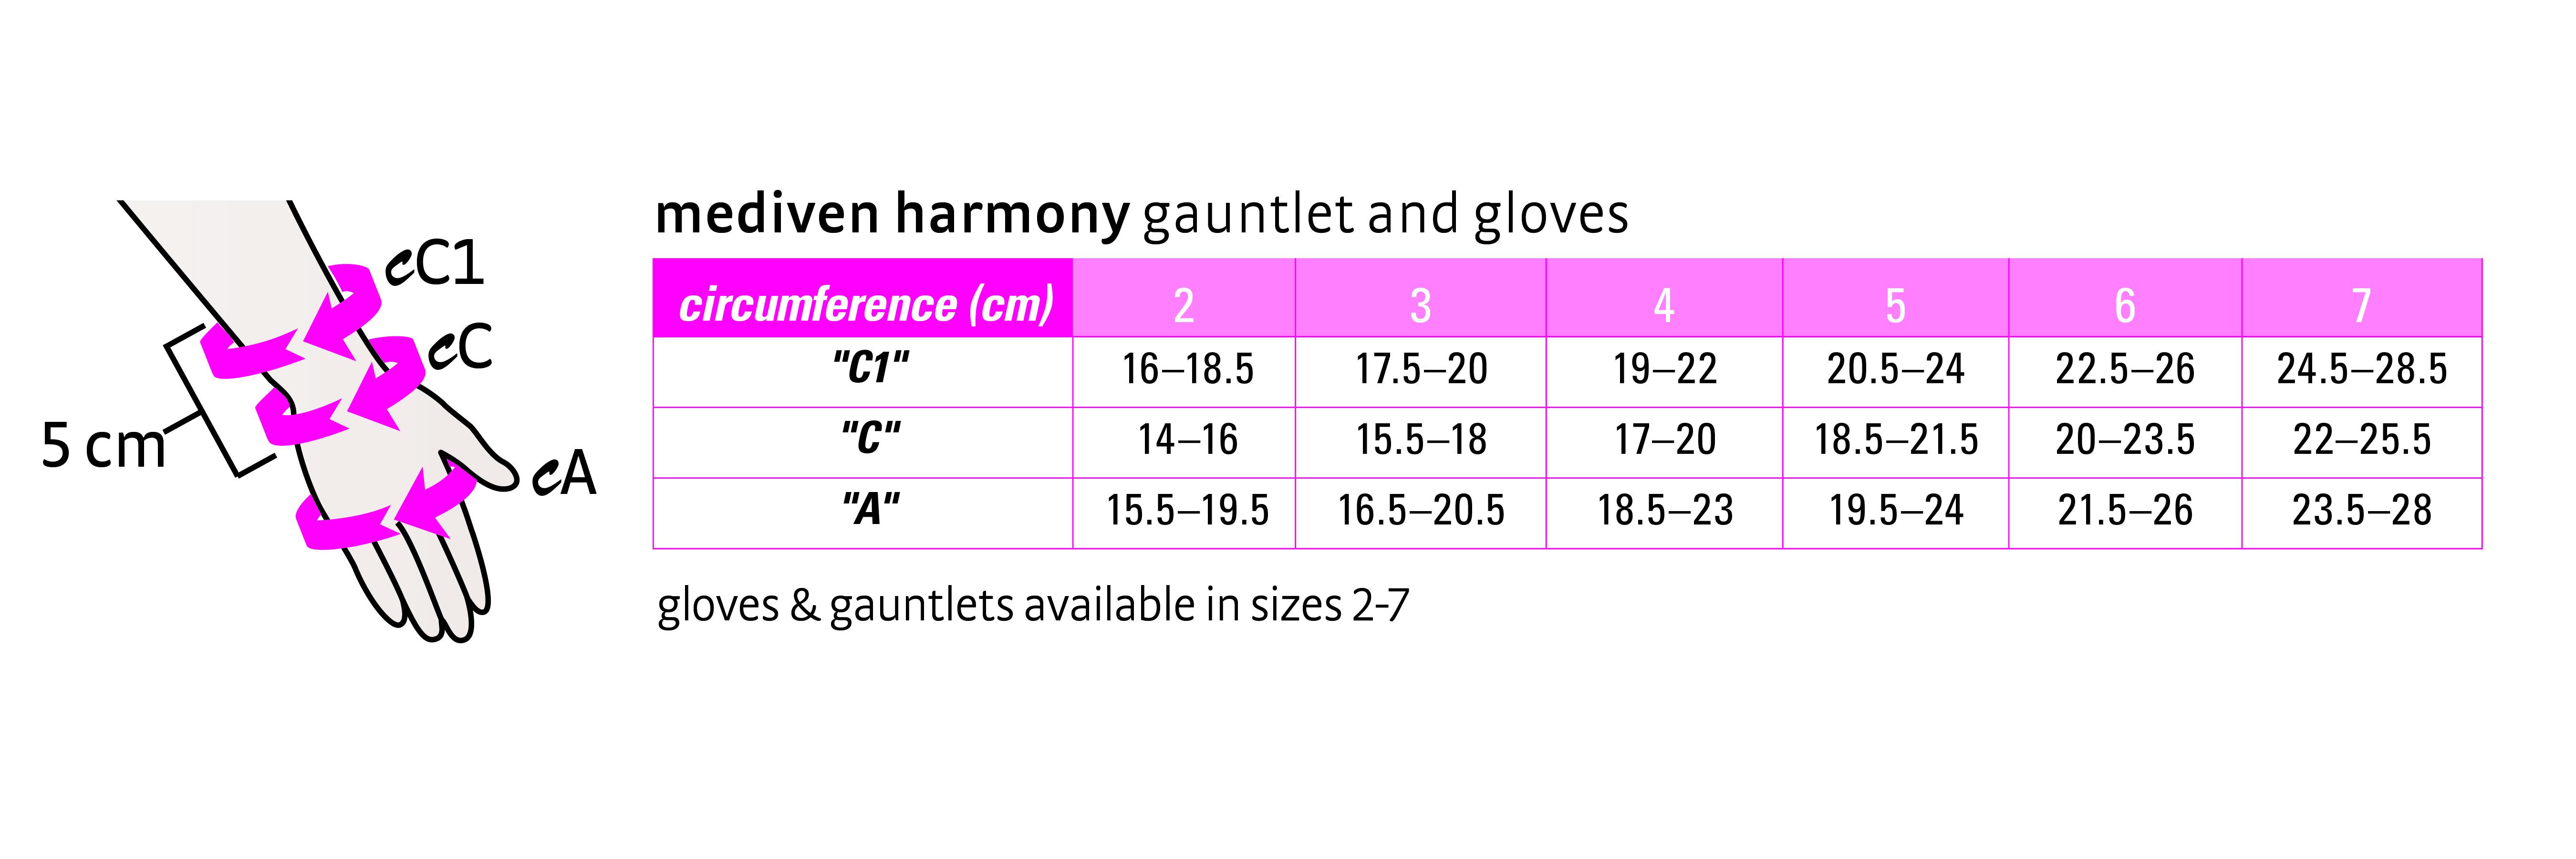 e548-harmony-glove-gauntlet-size-chart-final.jpg